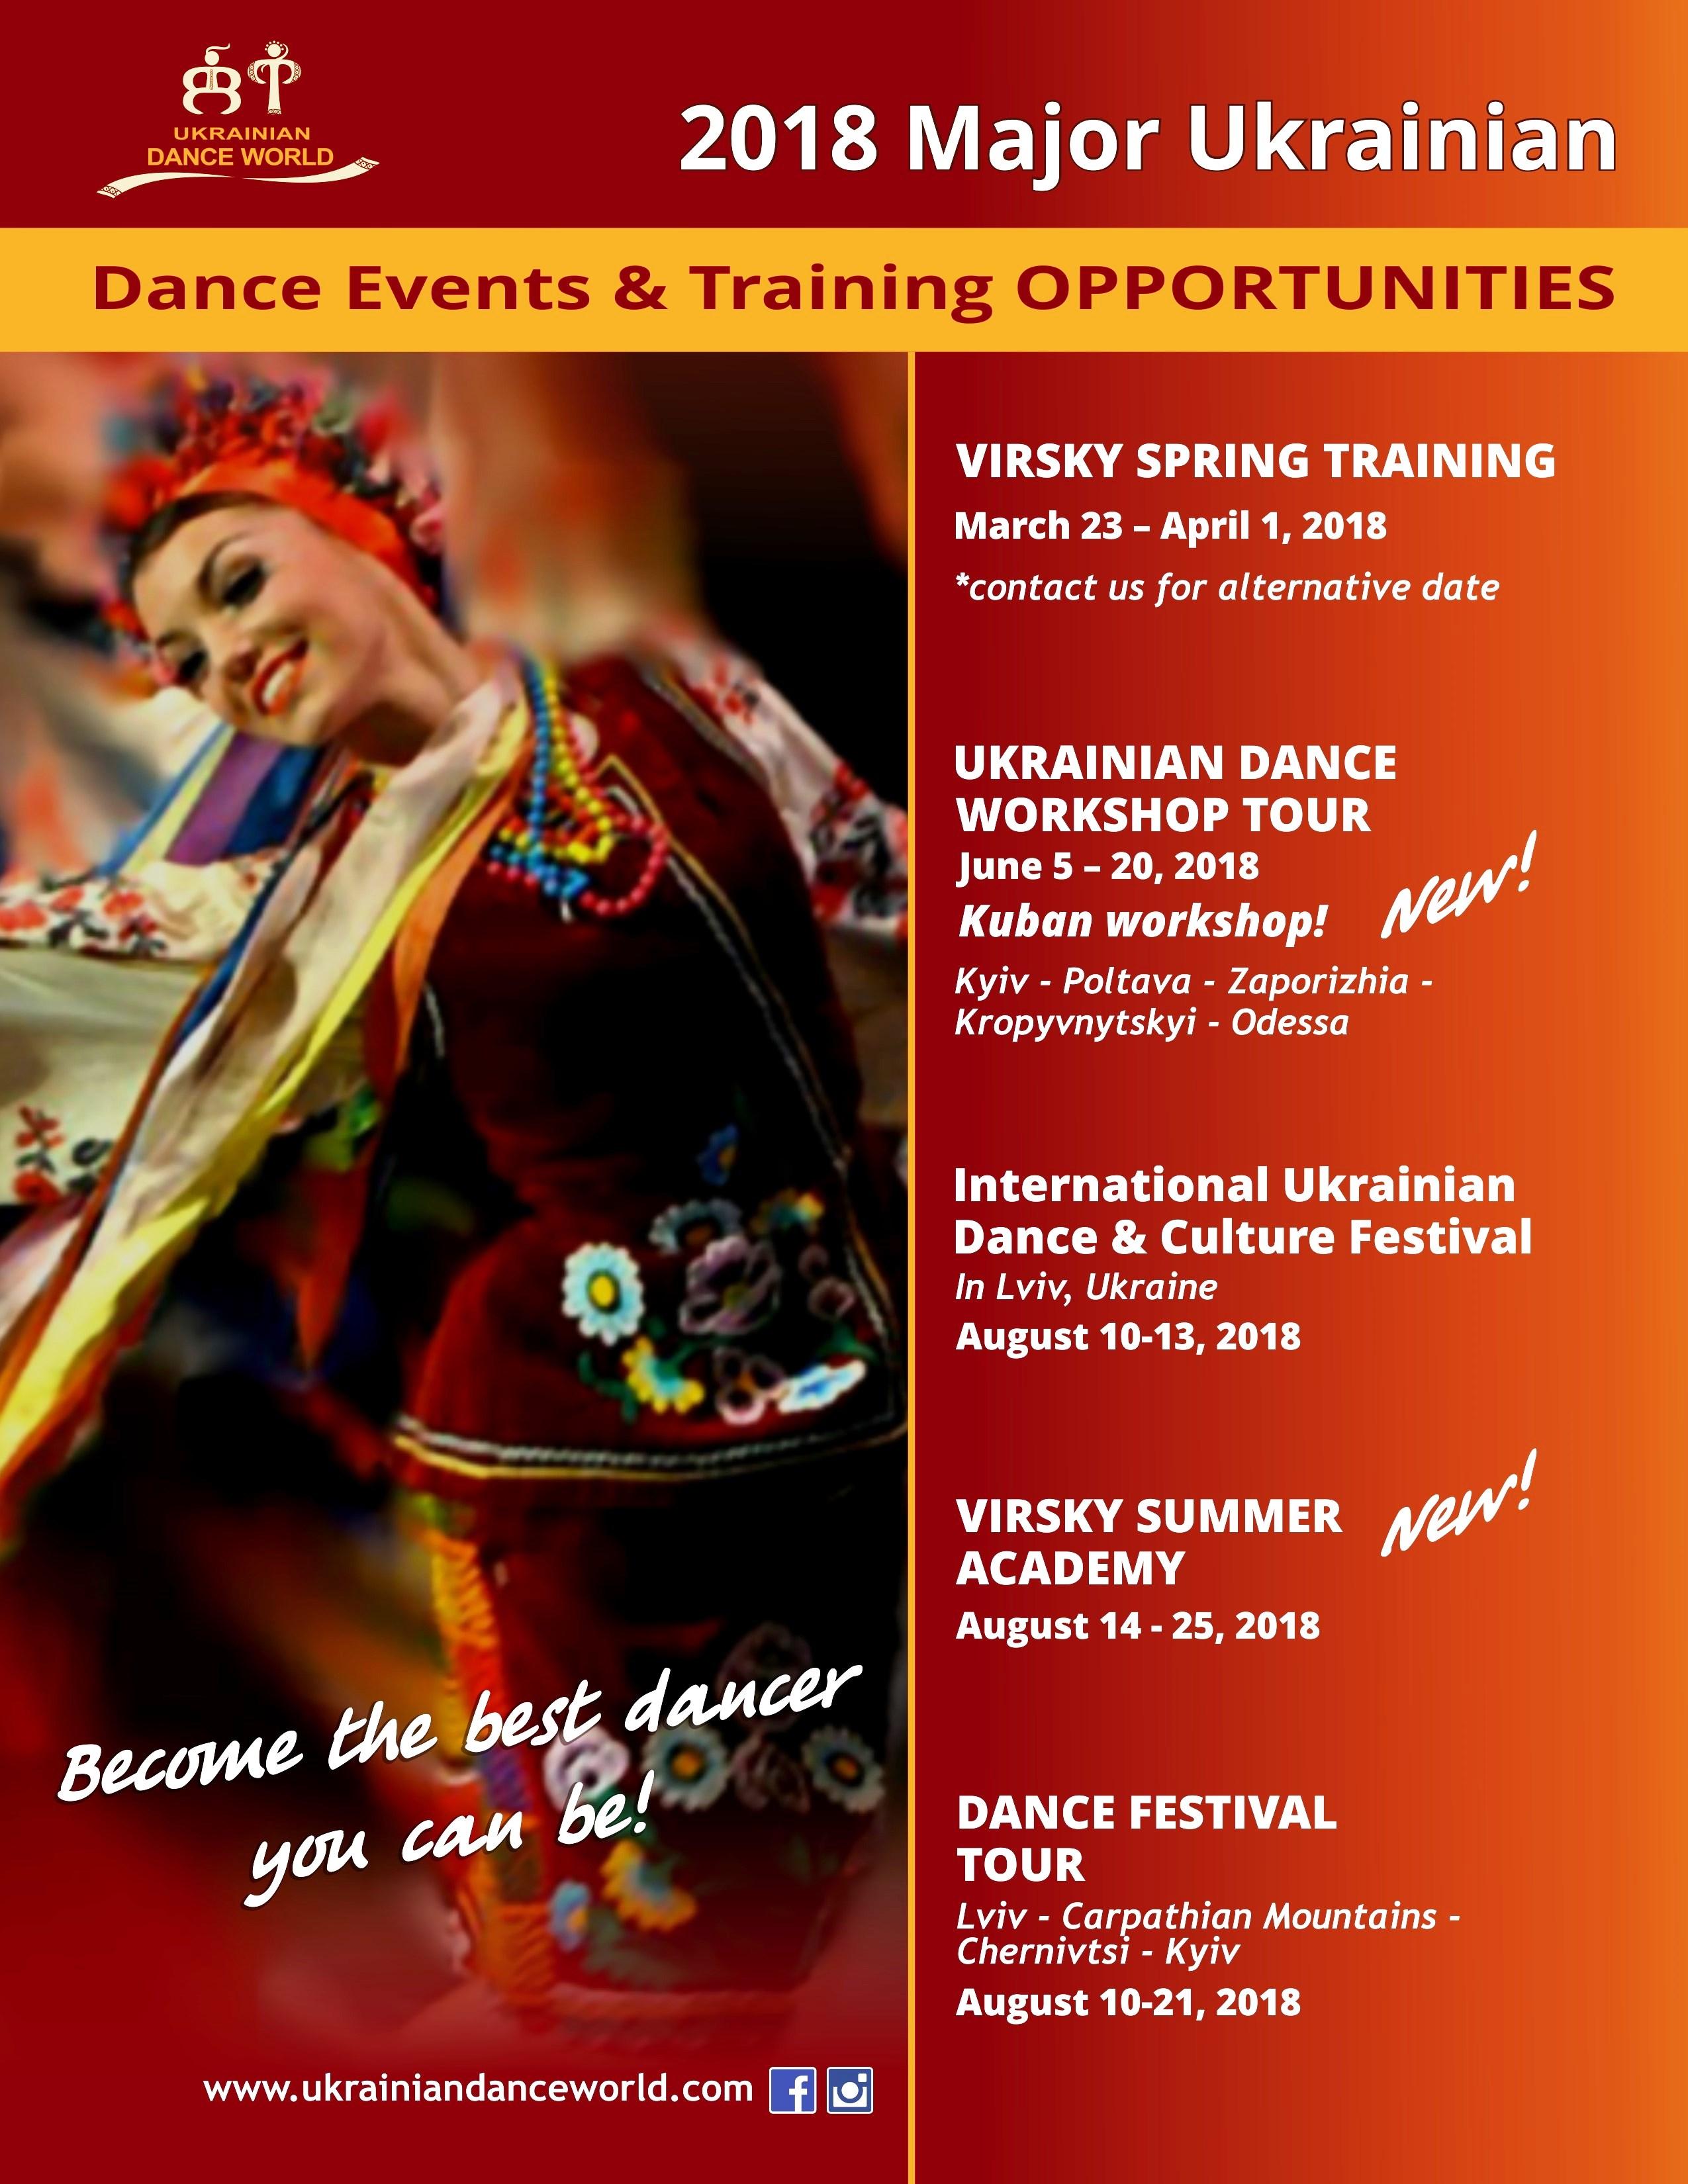 2018 Major Ukrainian Dance Events and Training Opportunities